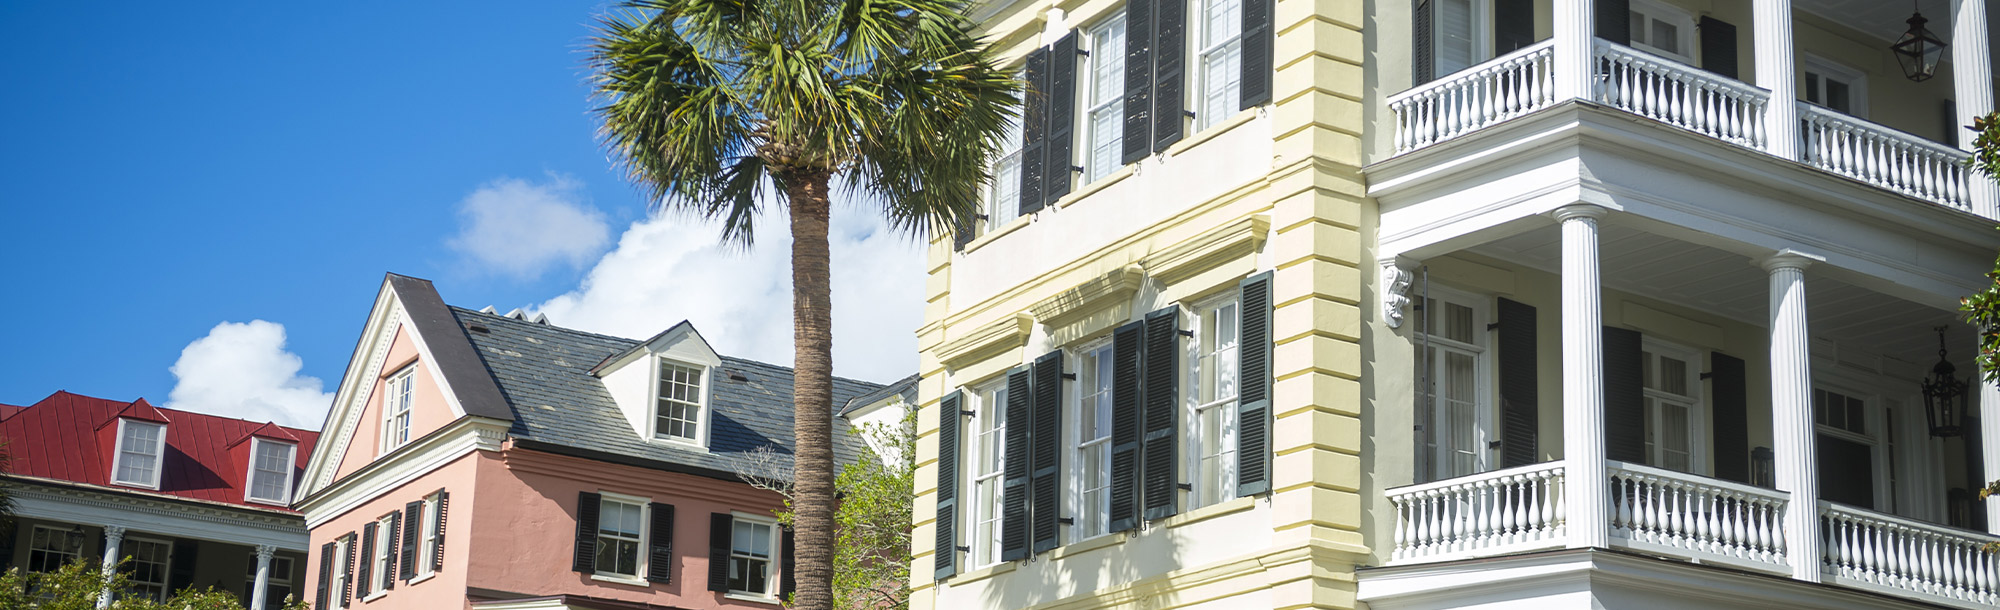 Home Insurance In Charleston